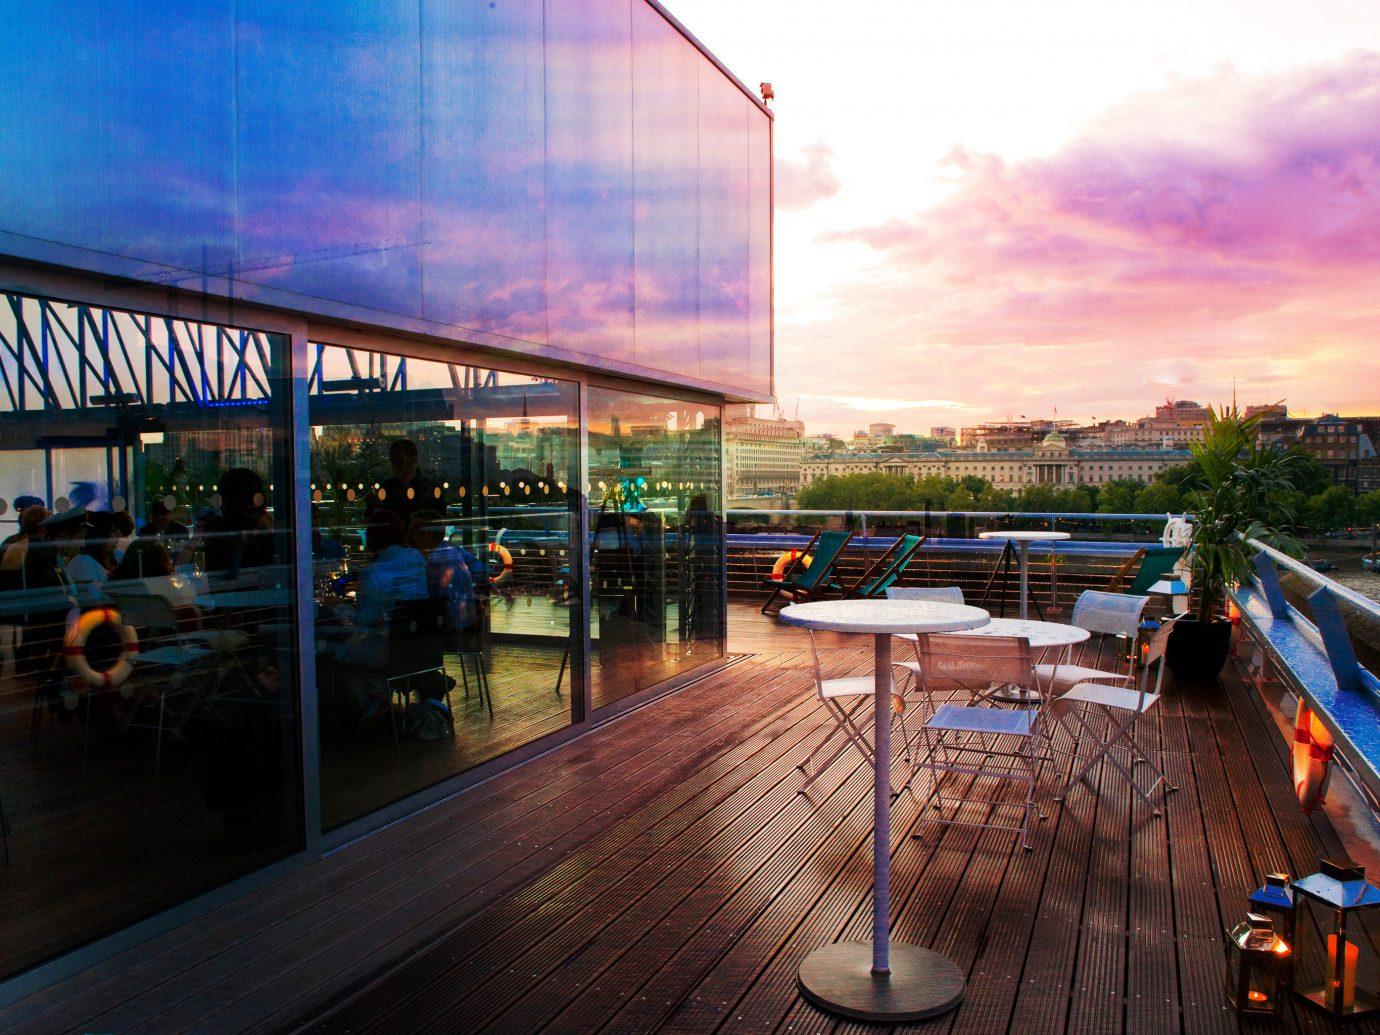 Arts + Culture sky outdoor reflection urban area Architecture vacation evening cityscape waterway dock Sunset dusk vehicle marina